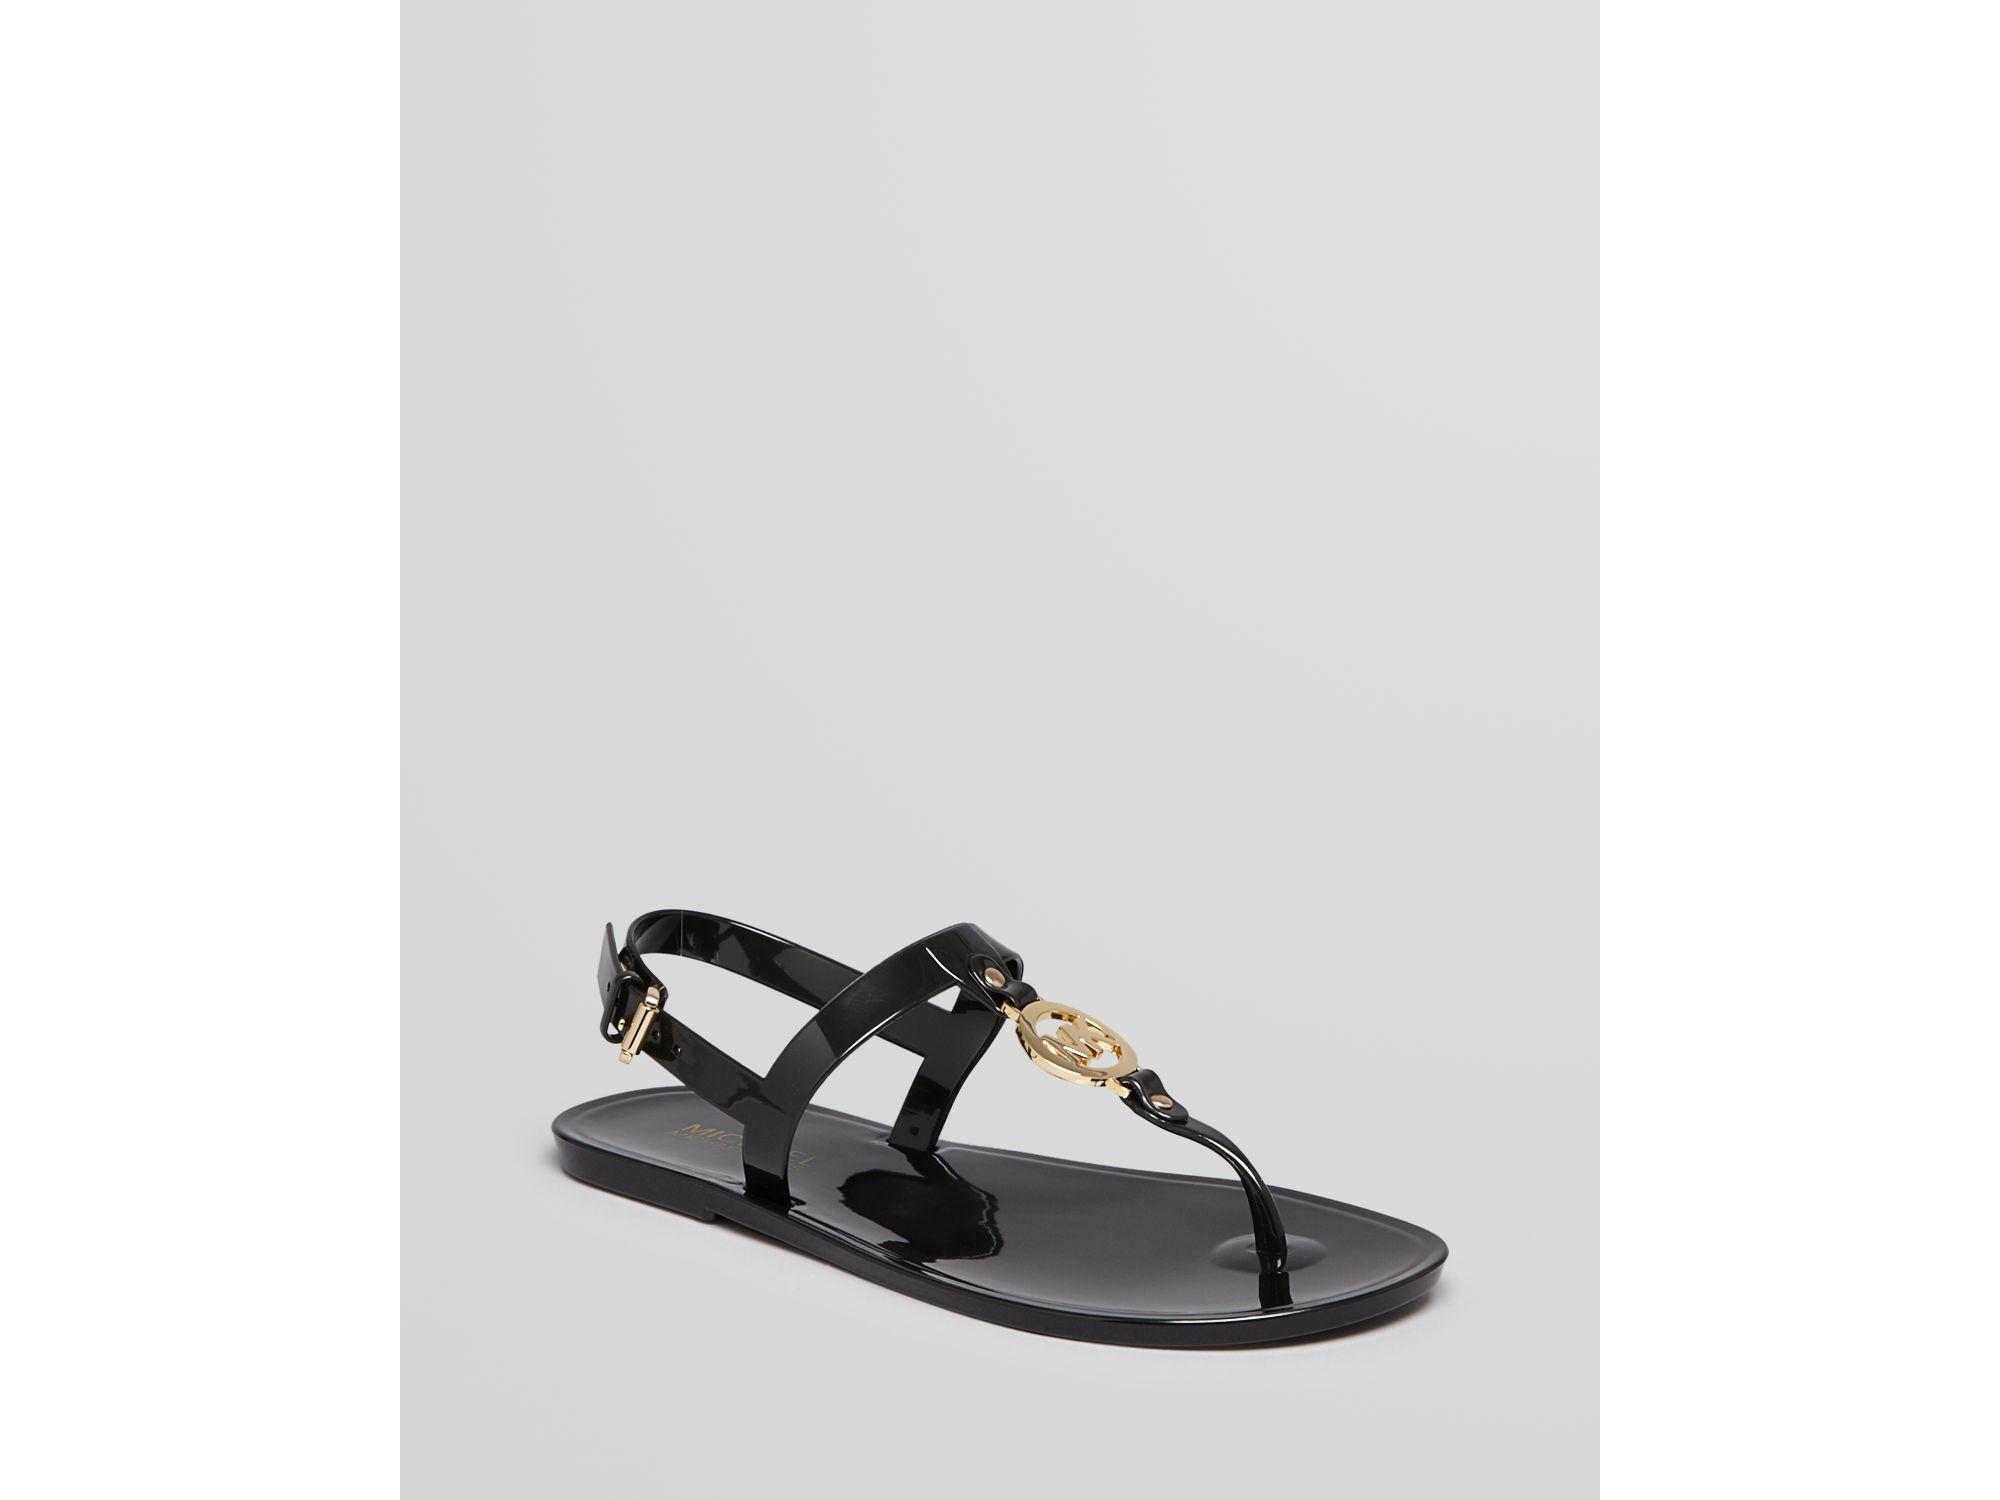 aee8a6801da619 Lyst - MICHAEL Michael Kors Jelly Flat Thong Sandals Mk Sondra in Black